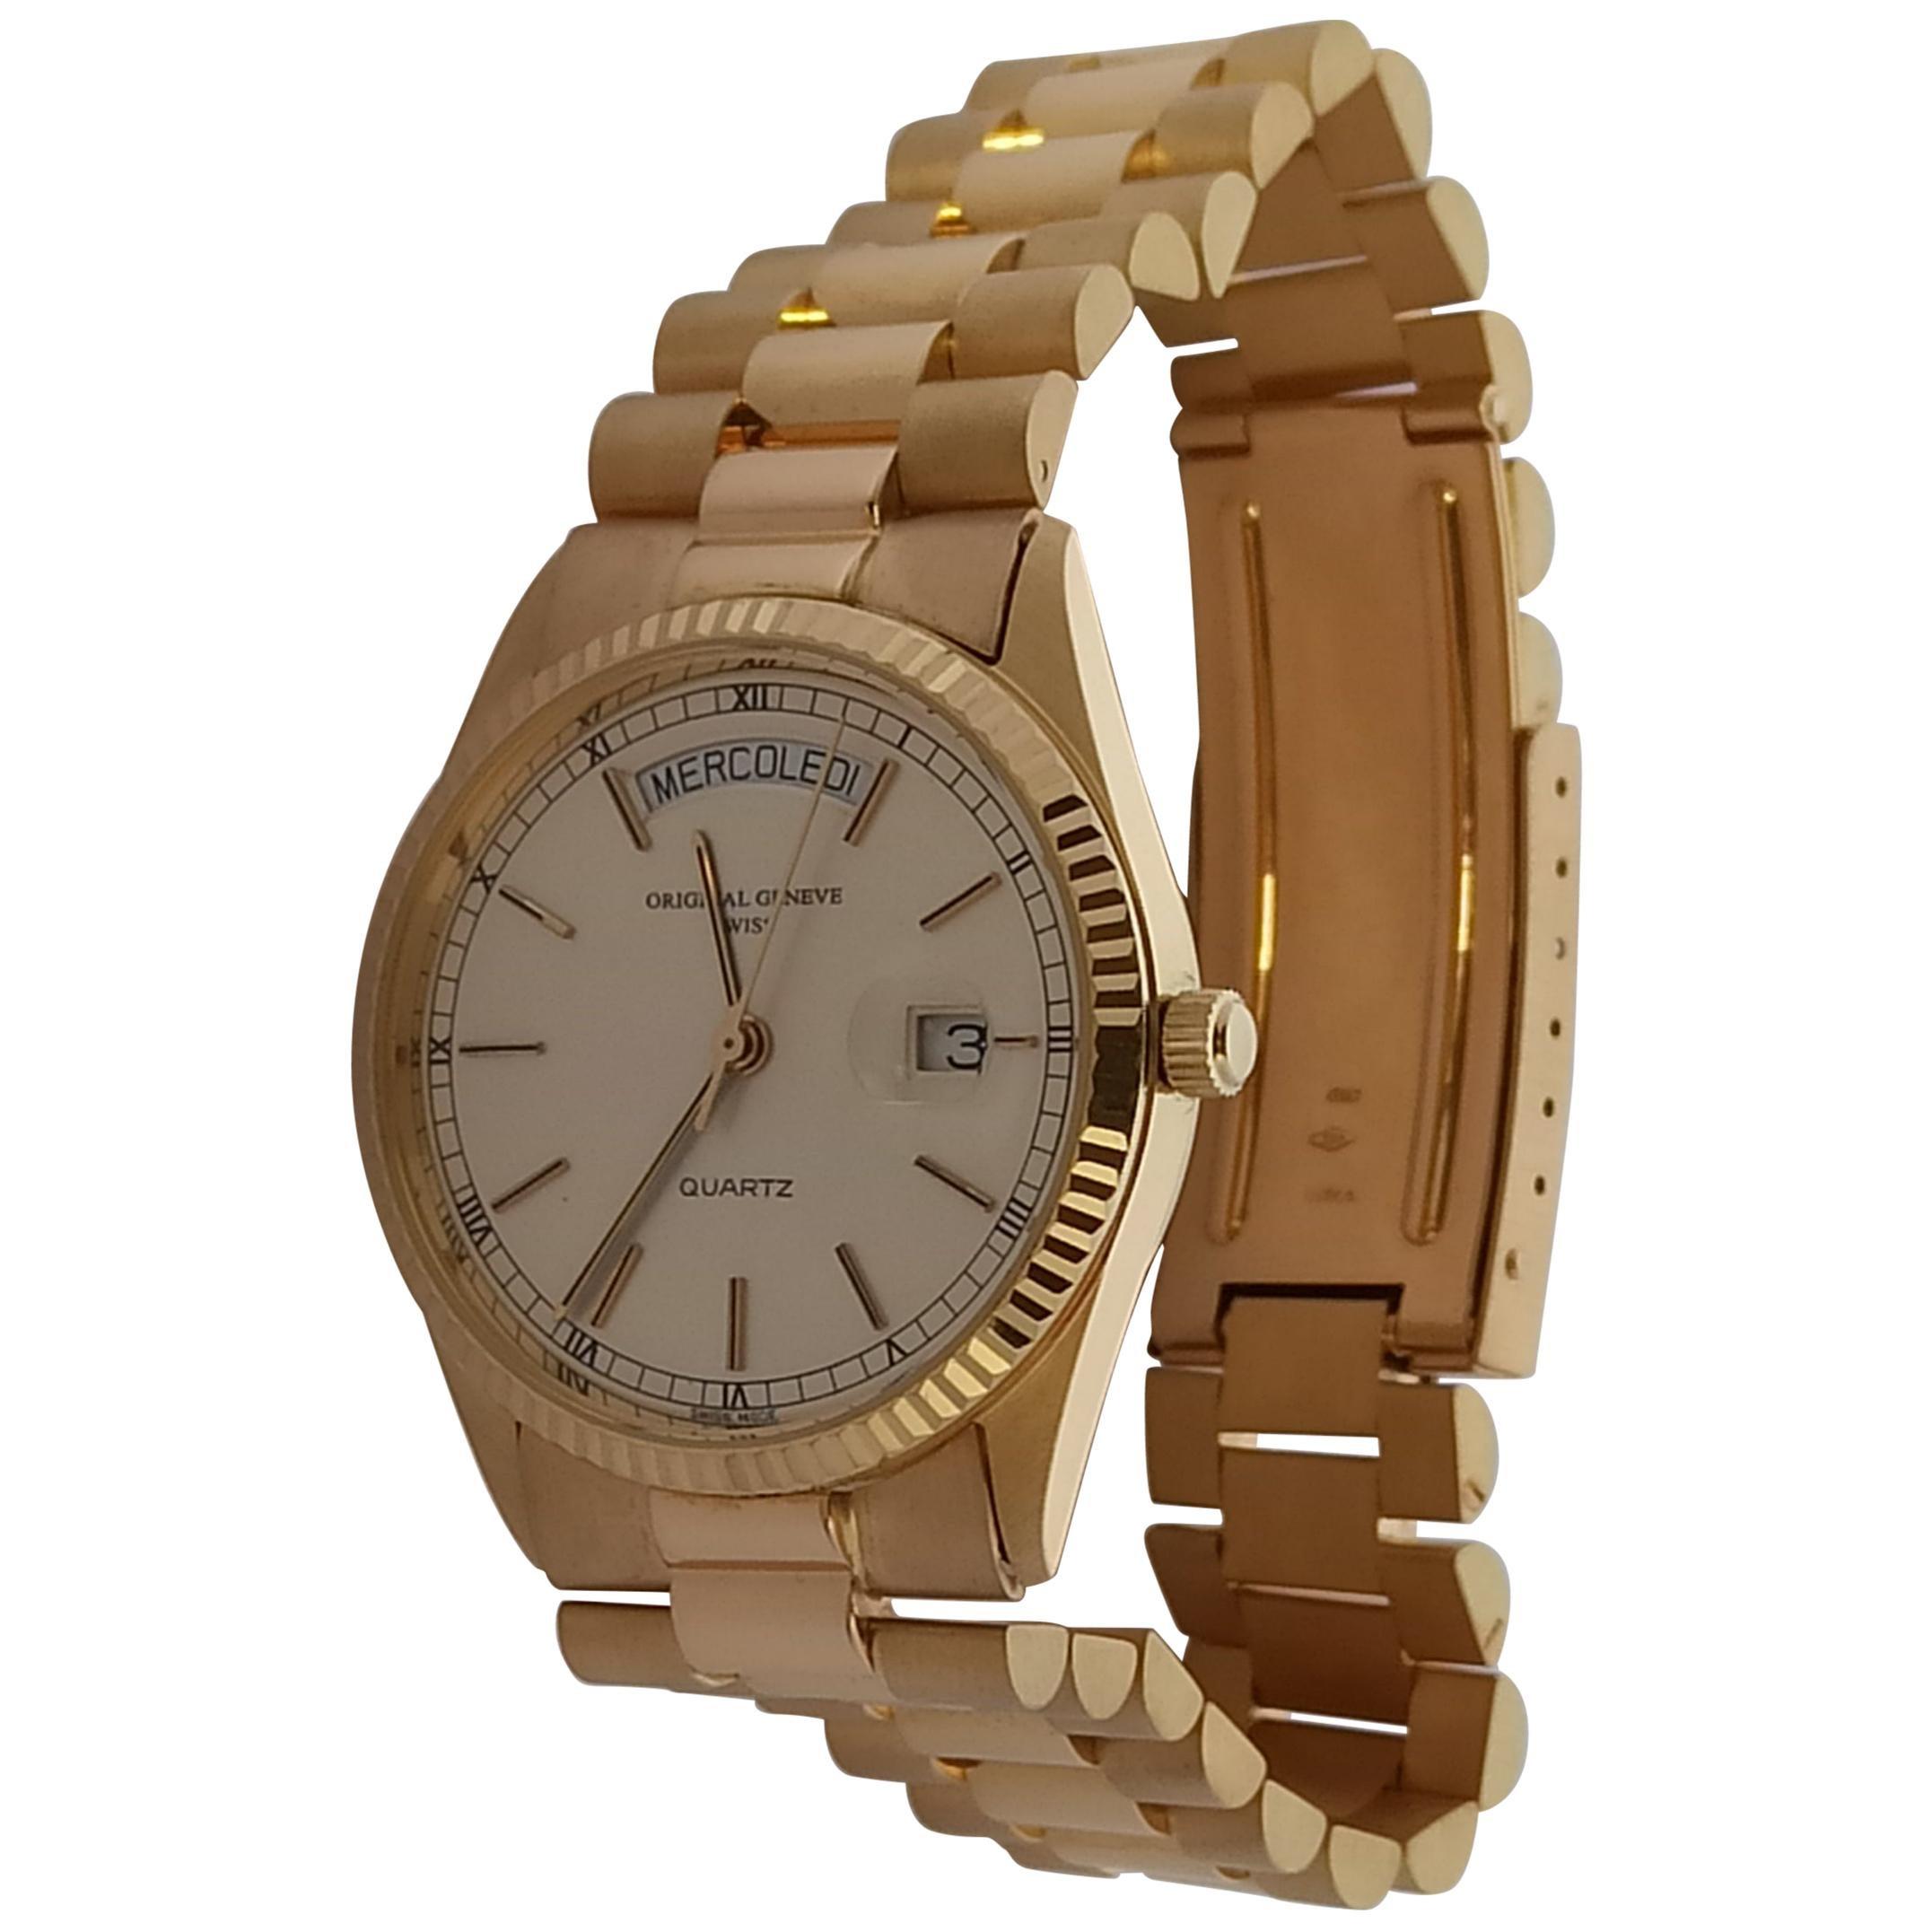 Original Geneve, DayDate Style 18 Karat Solid Gold Wristwatch President Bracelet